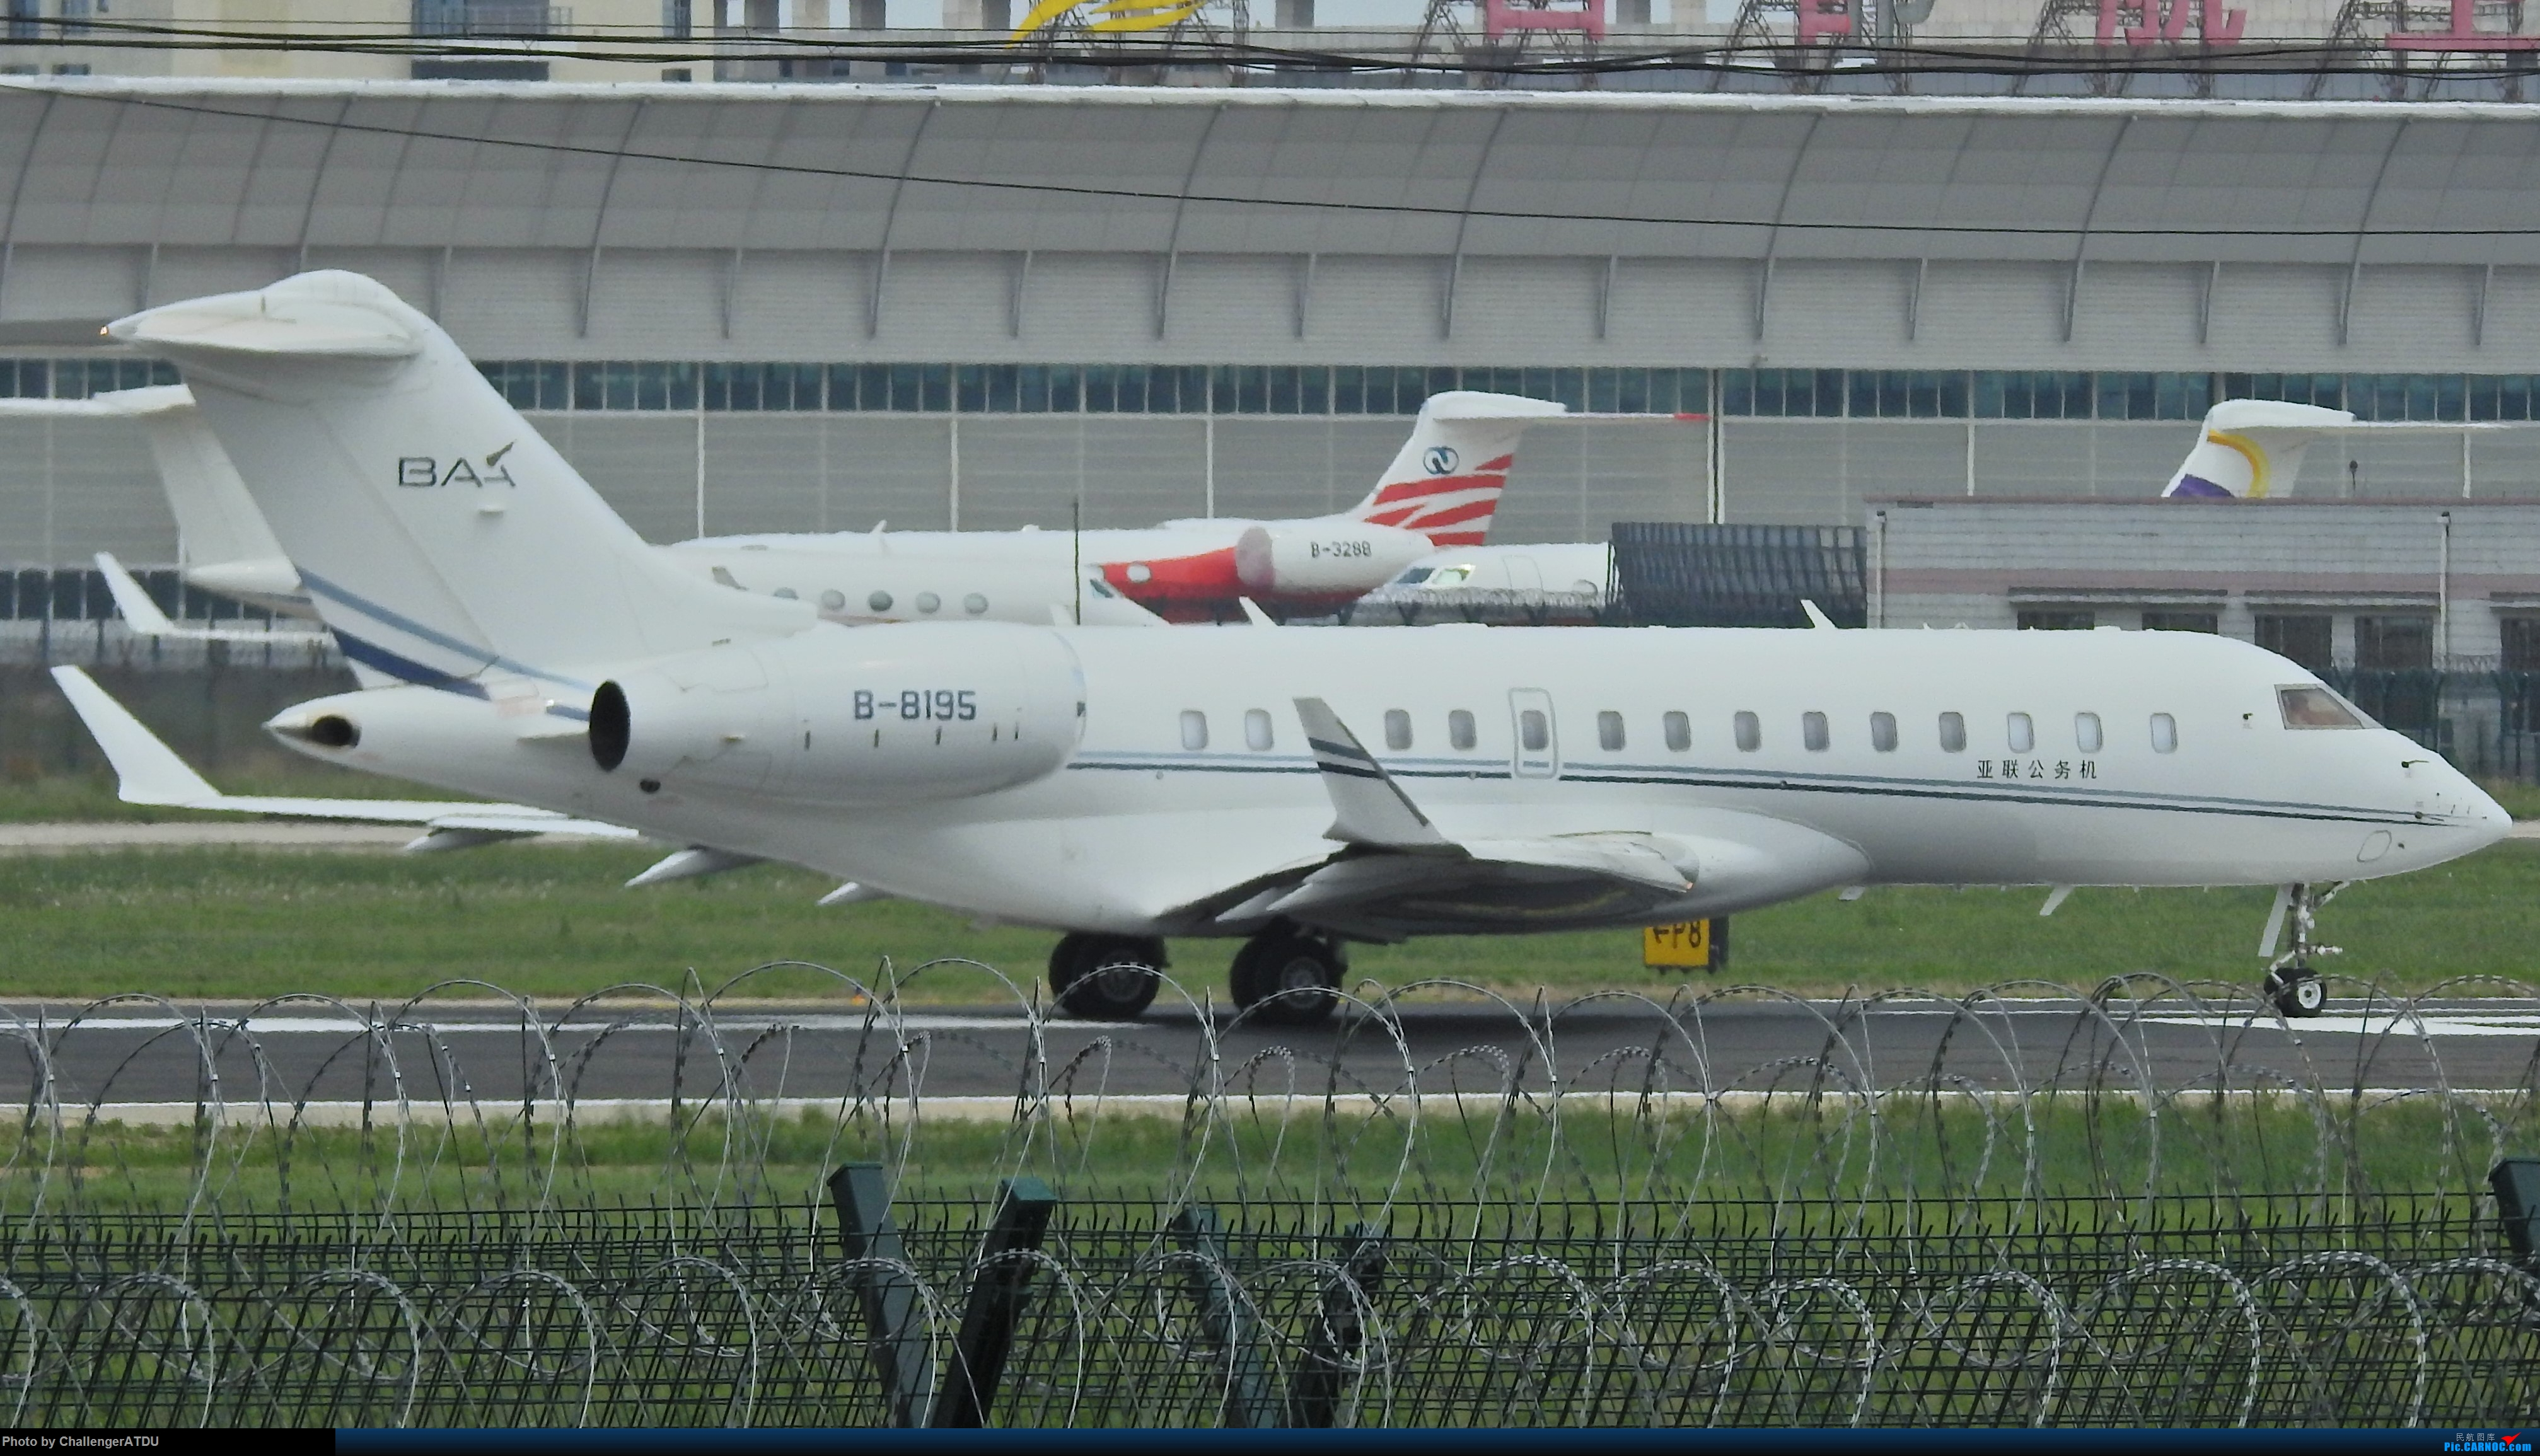 Re:[原创]2020-5-30 萌新のPEK之旅 BOMBARDIER BD-700-1A10 B-8195 北京首都国际机场